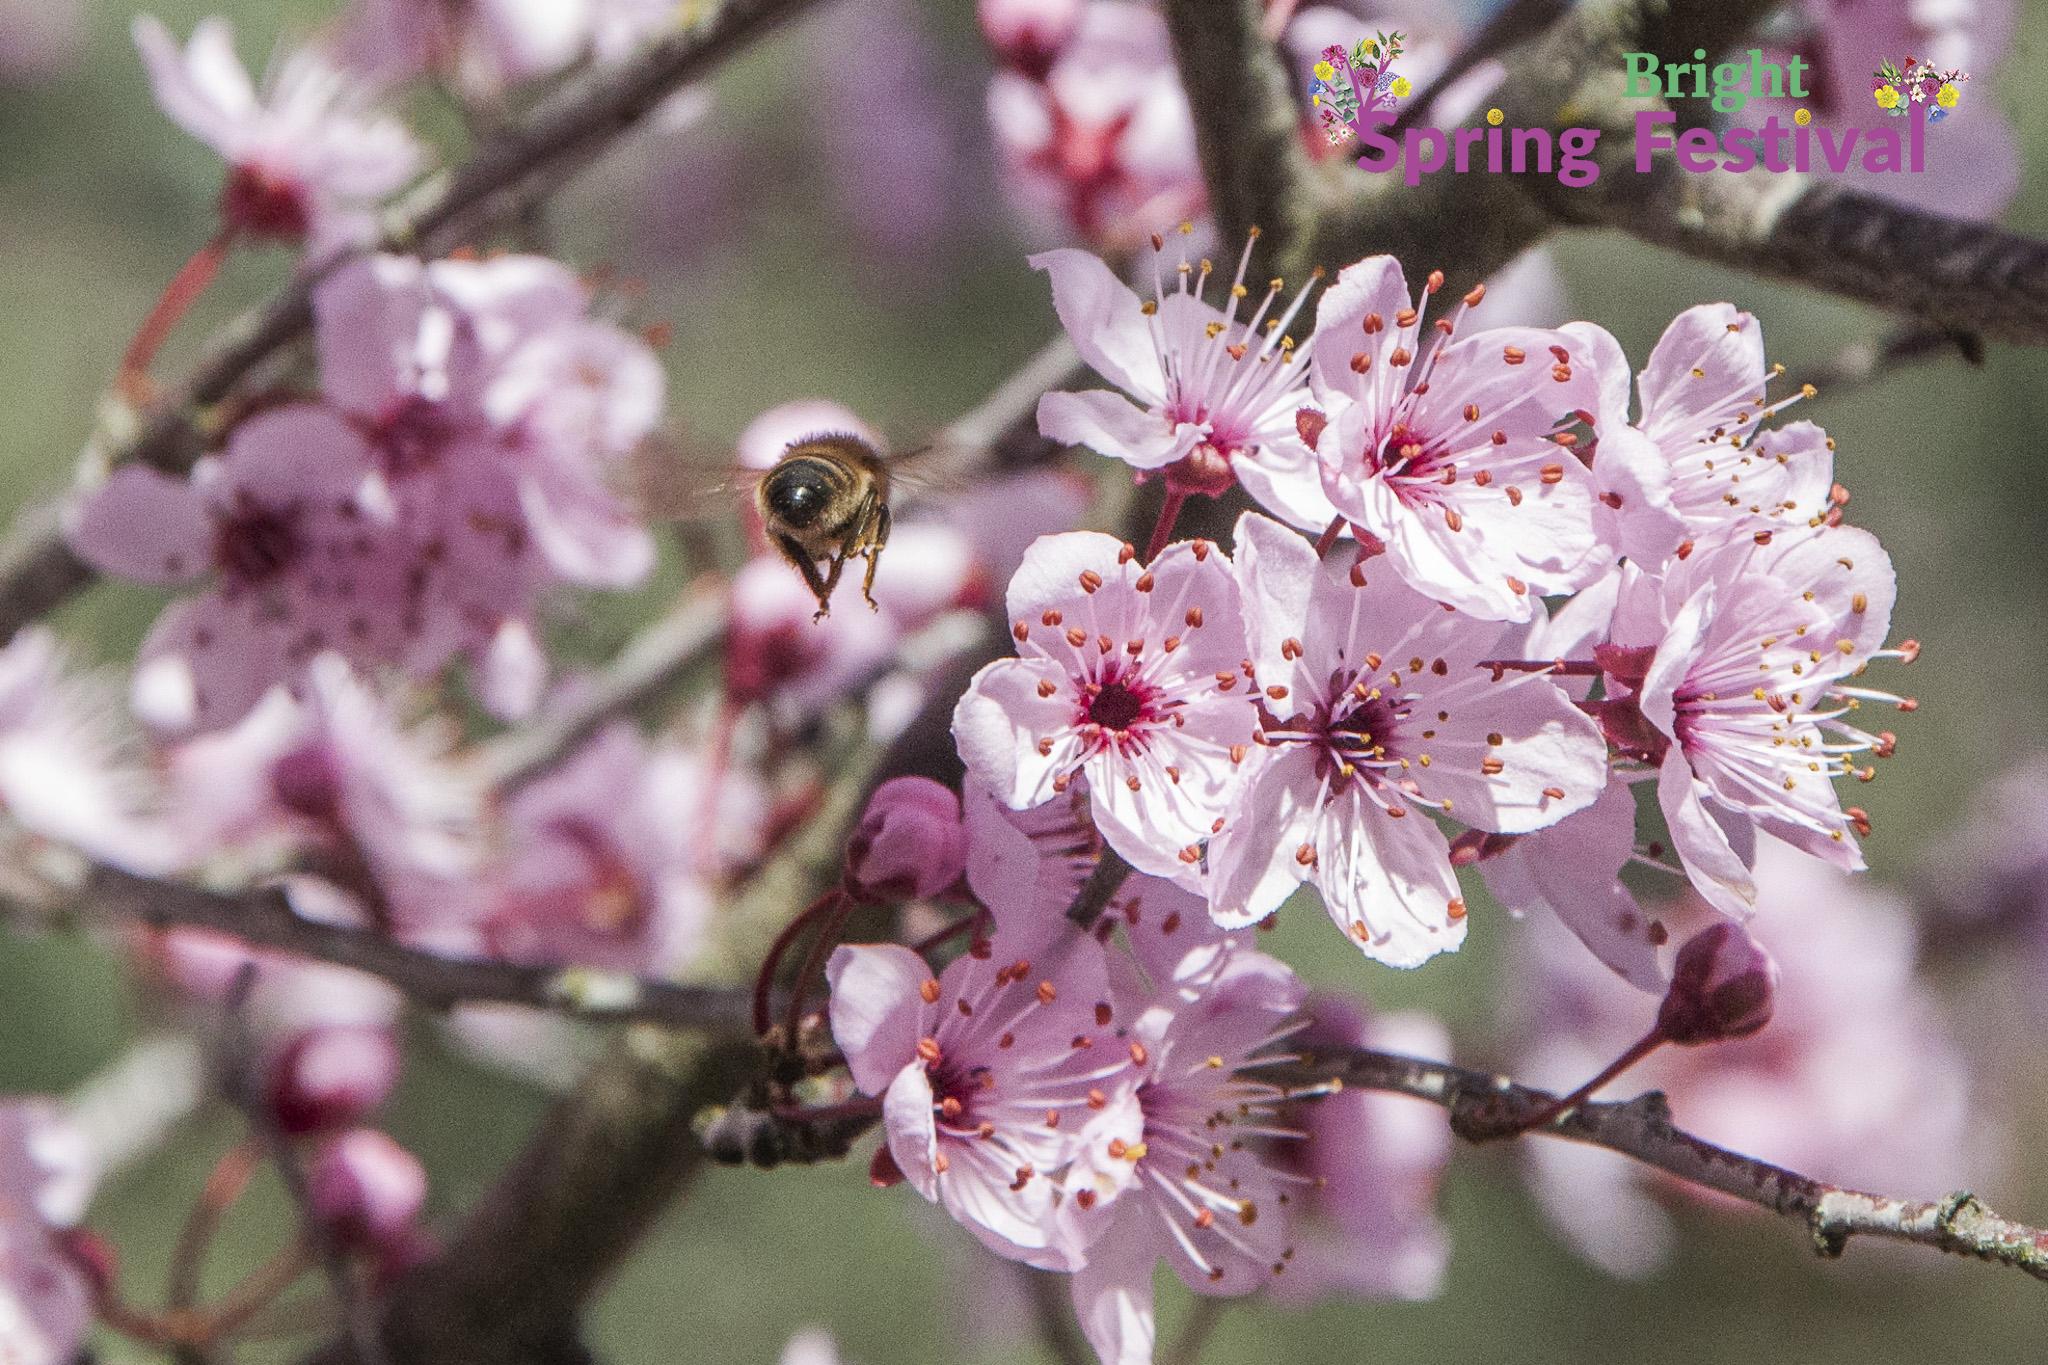 Brigh Spring Festival - 054